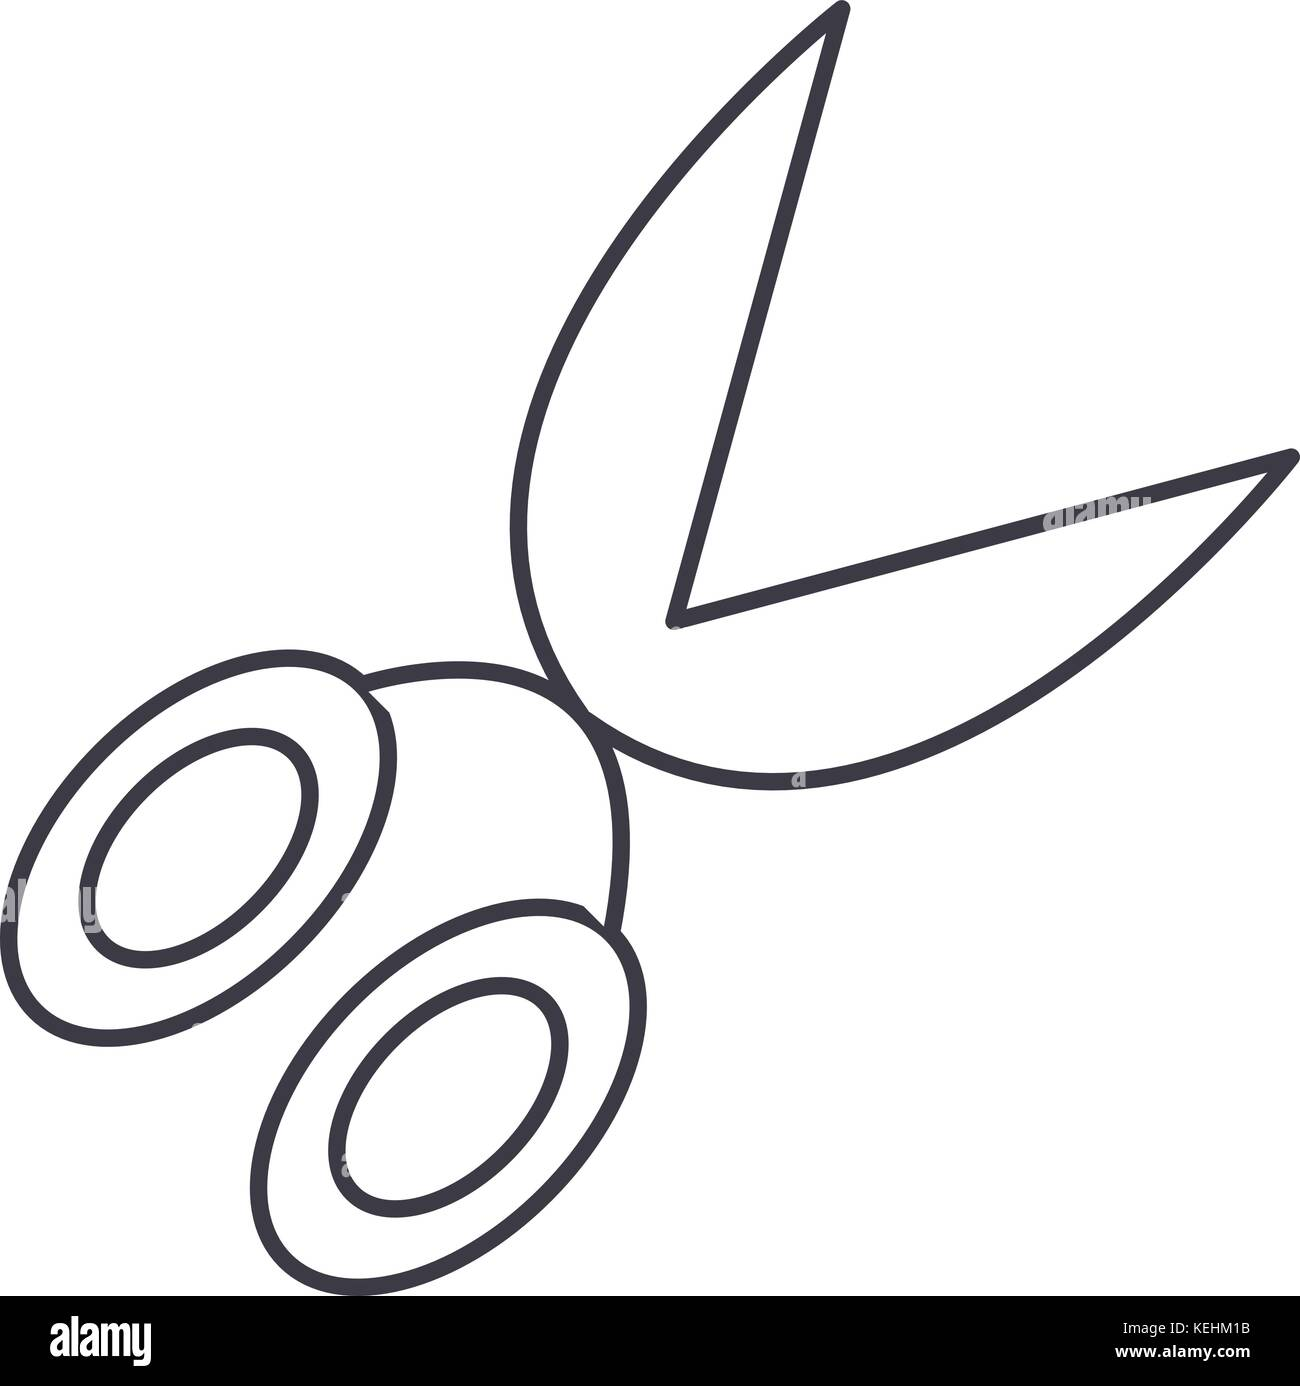 garden scissors  vector line icon, sign, illustration on background, editable strokes Stock Vector